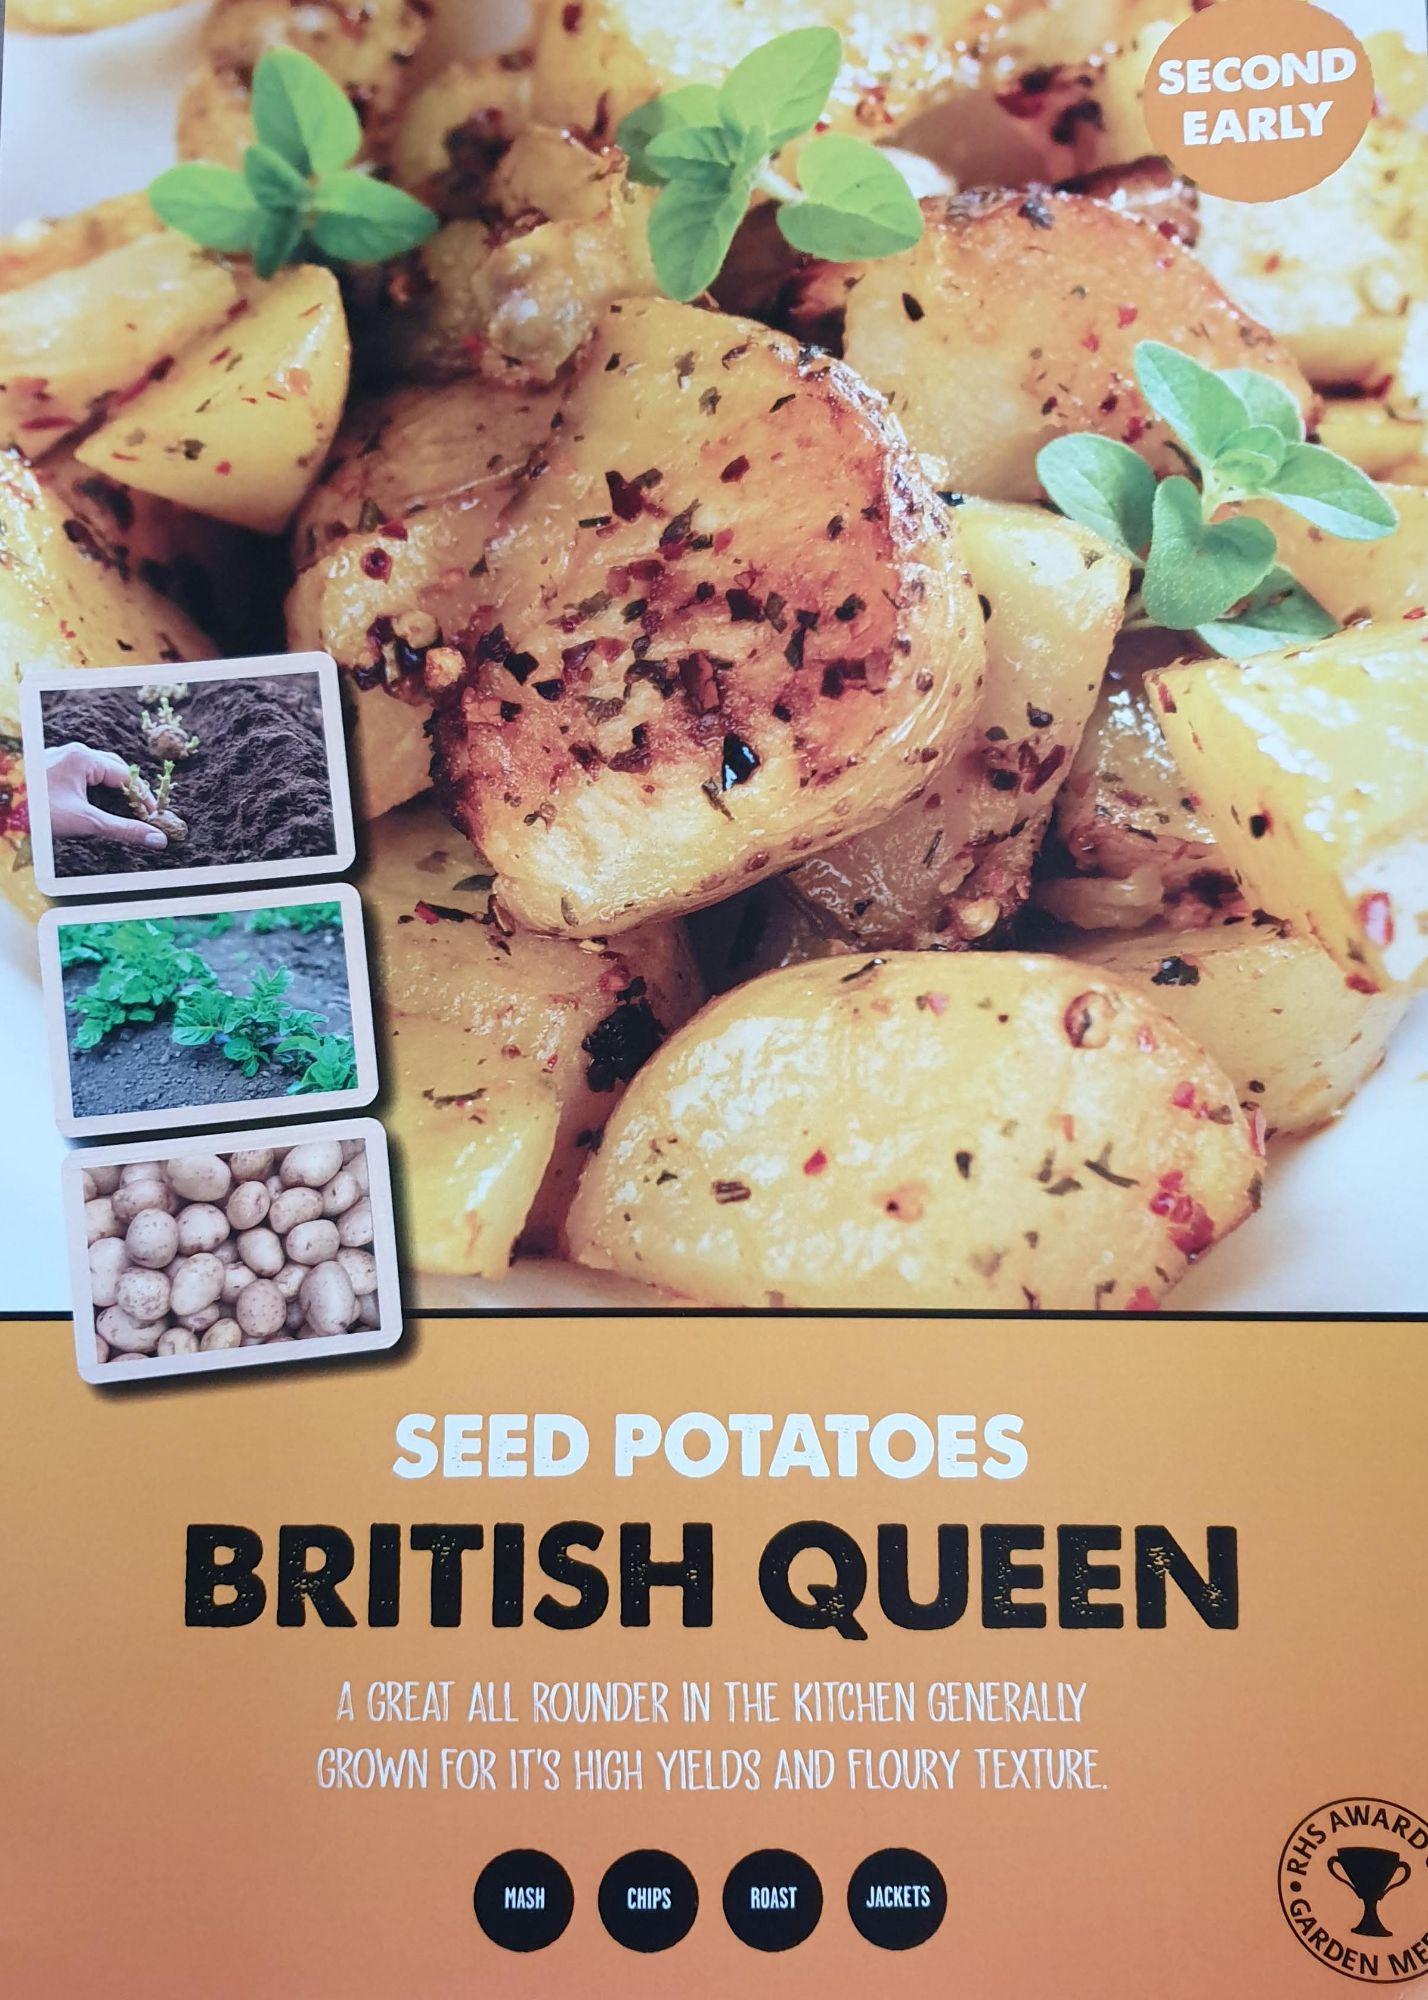 british_queen_seed_potato_info.jpg